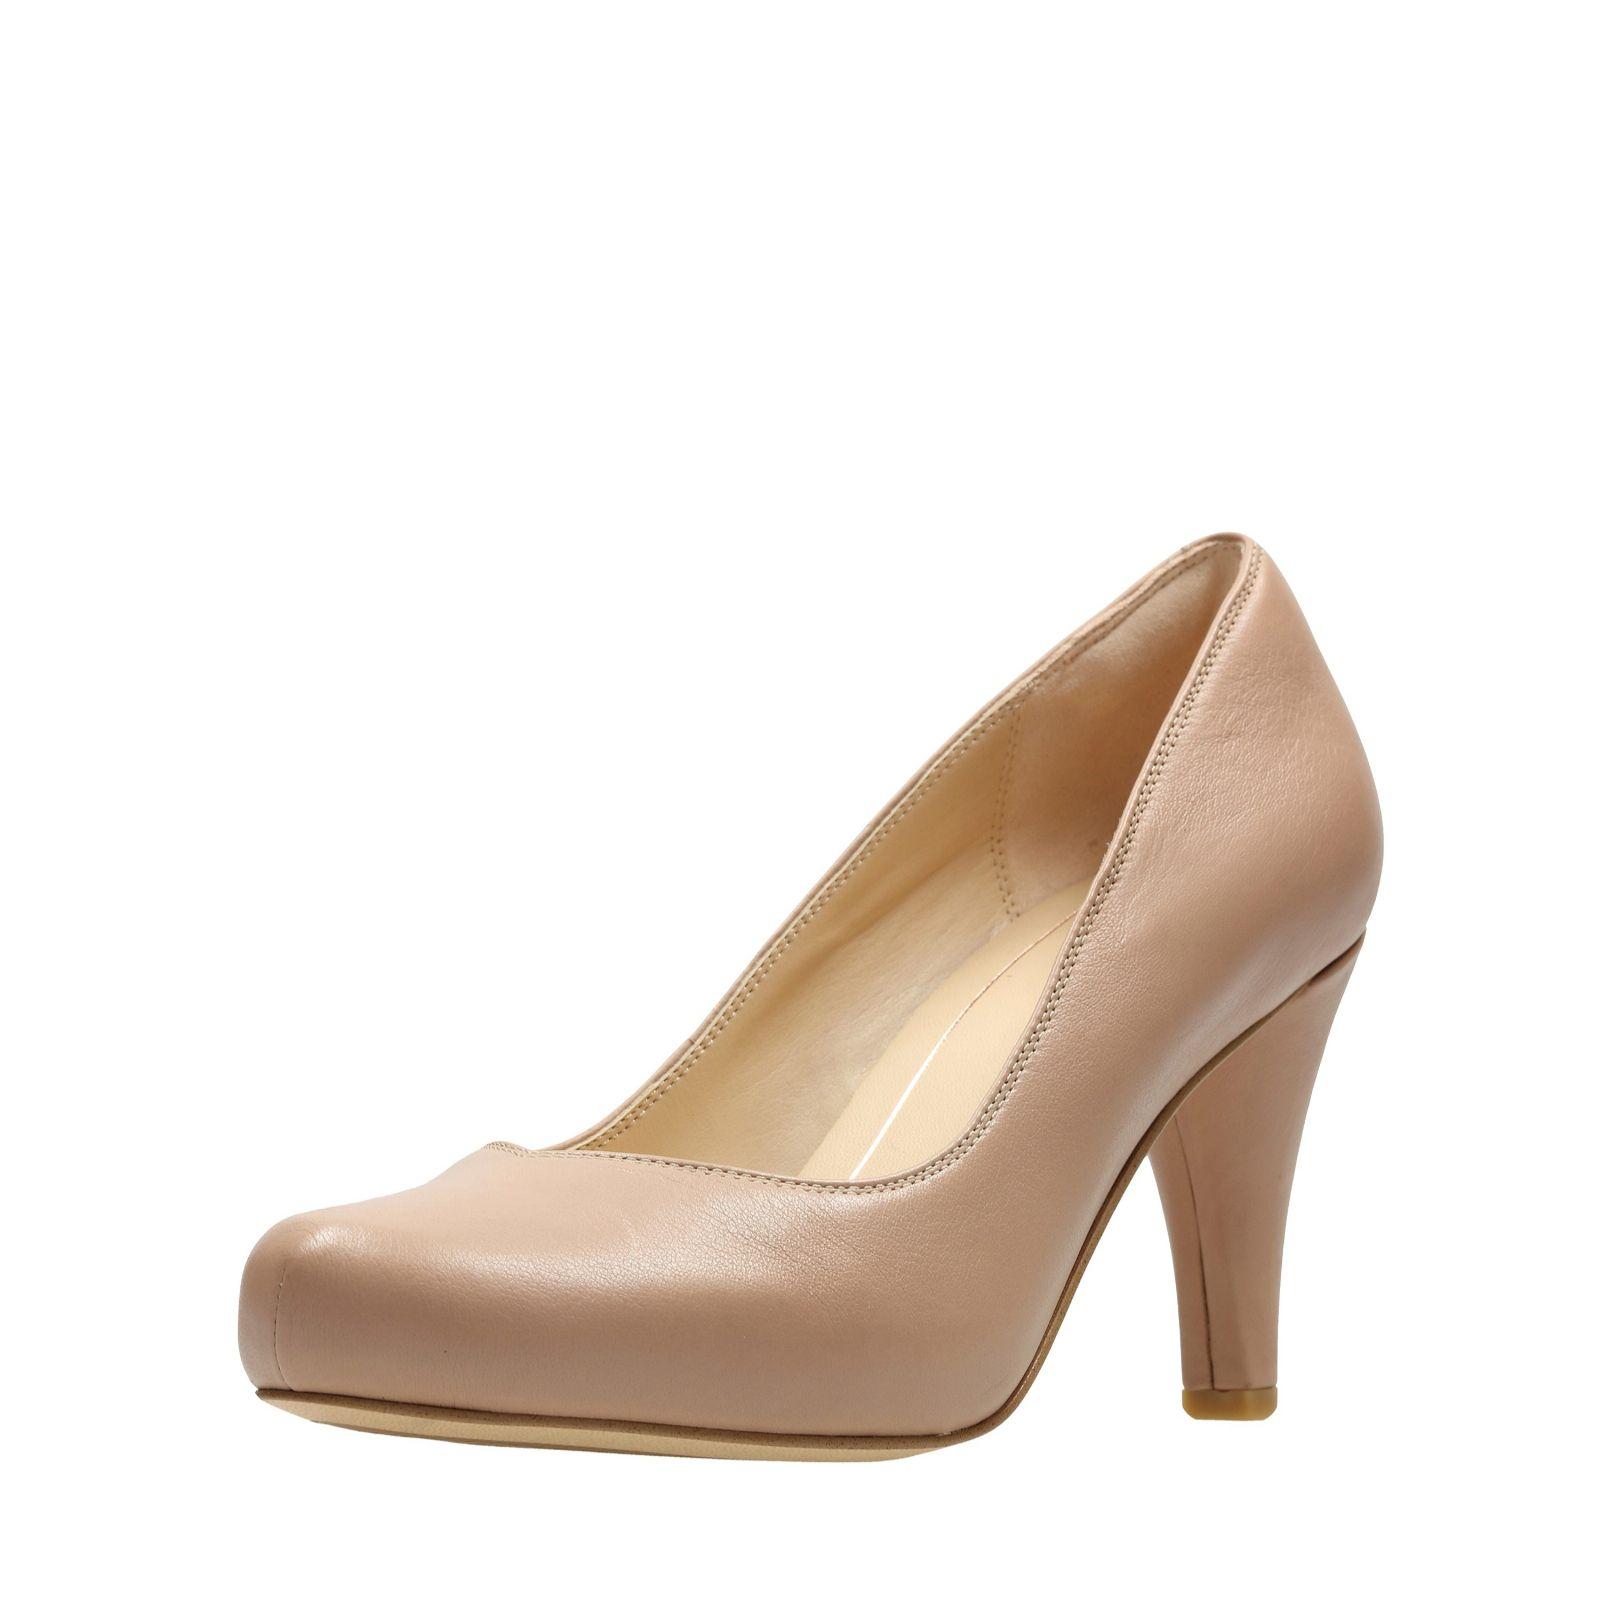 b9b2dcd37de Clarks Dalia Rose Court Shoe Wide Fit - QVC UK